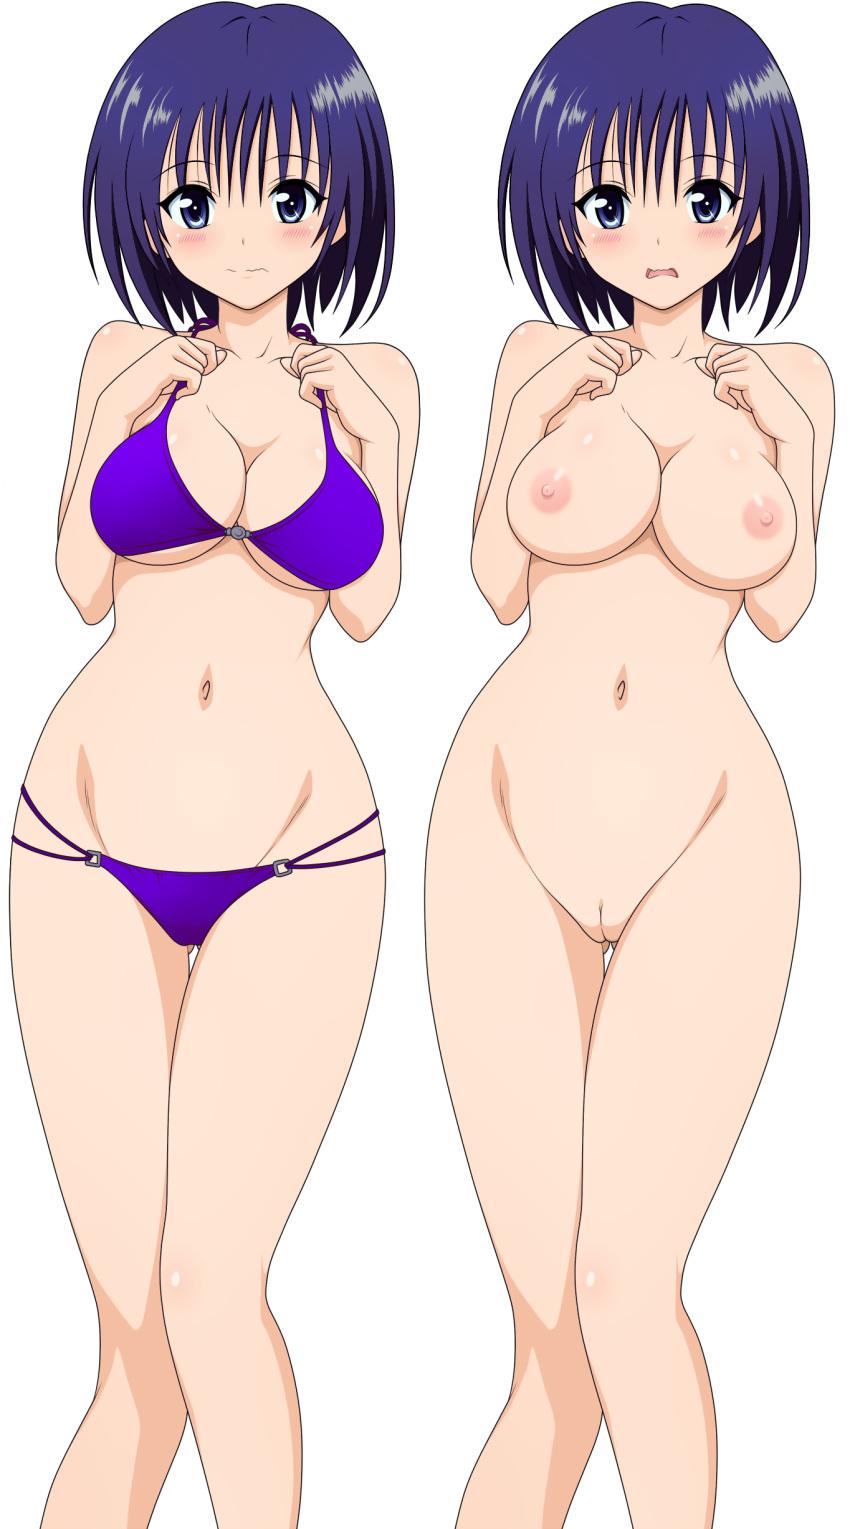 ru bath to love lala Digimon story cyber sleuth dianamon